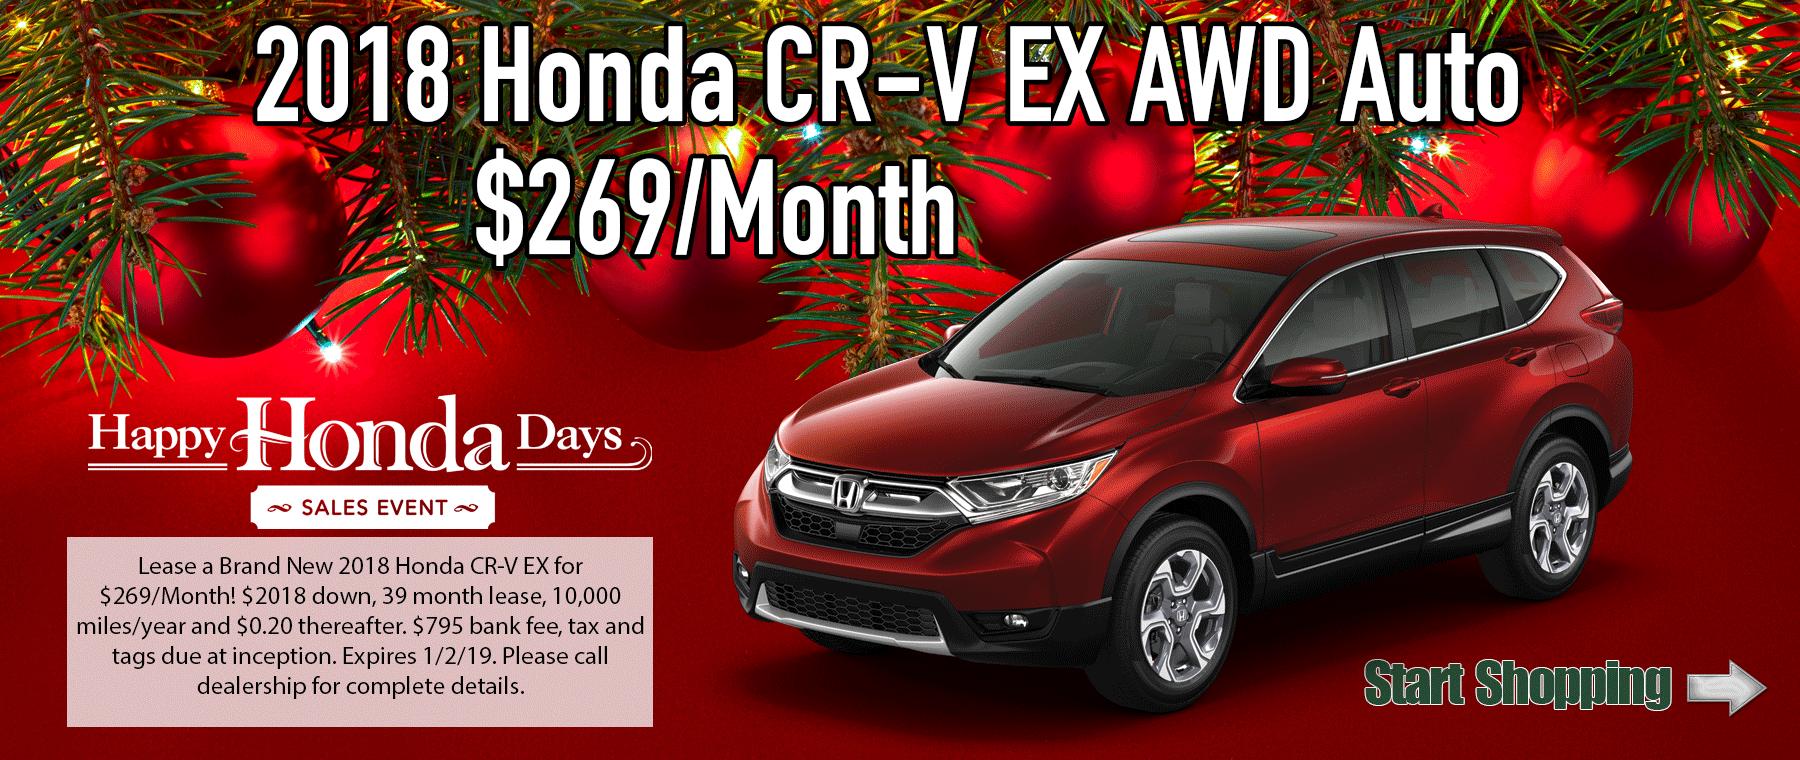 Honda CRV EX AWD